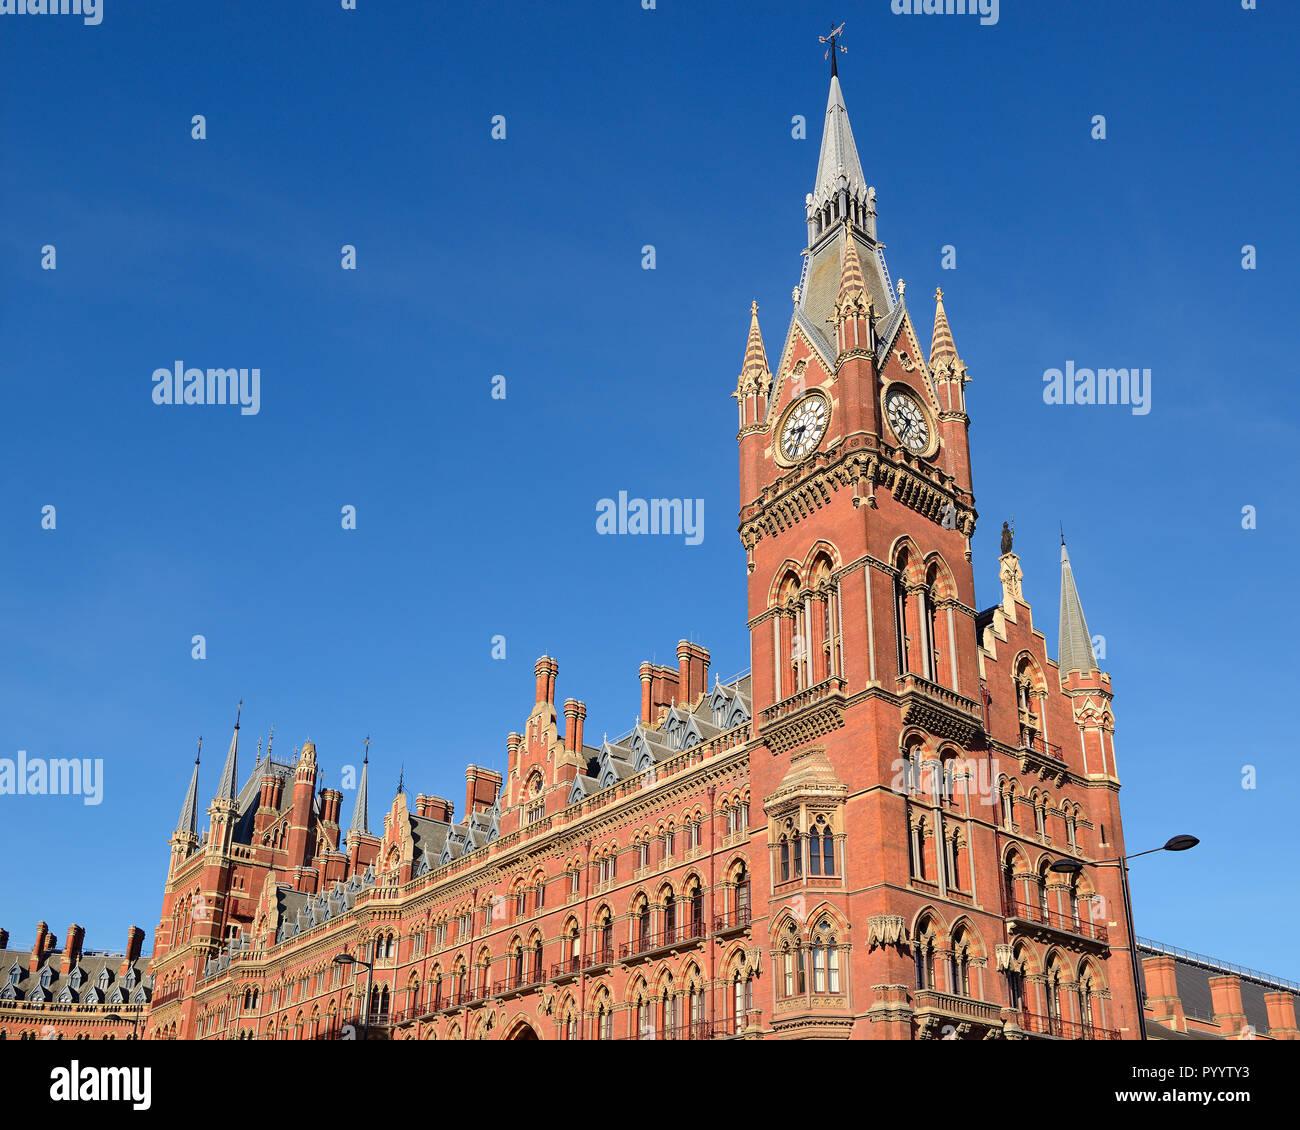 St Pancras Station, London, England, United Kingdom - Stock Image